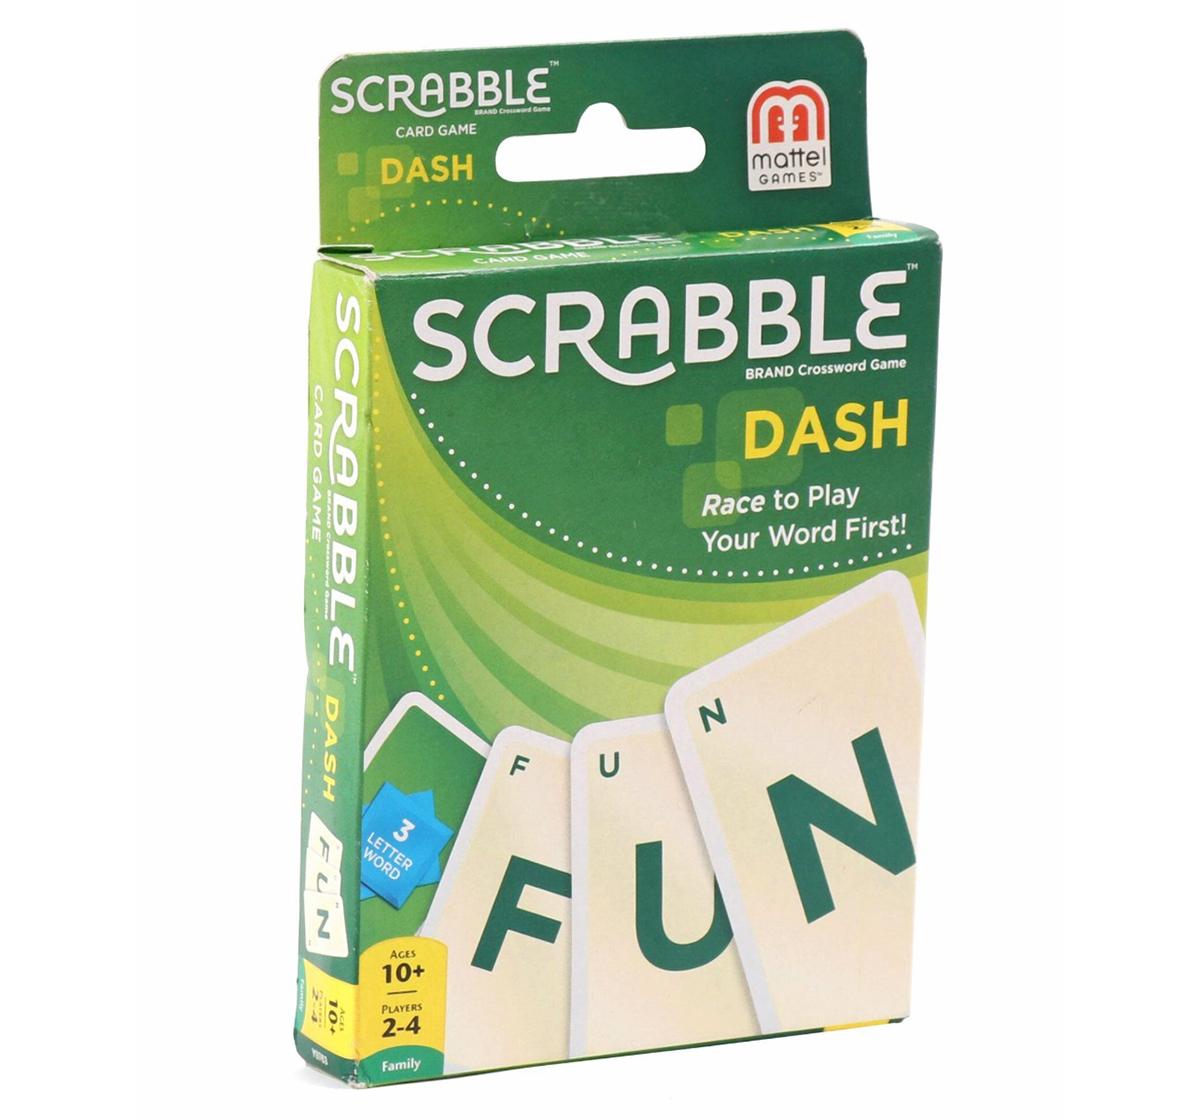 Mattel |  Mattel Scrabble Dash Card Game, Games for Kids age 10Y+